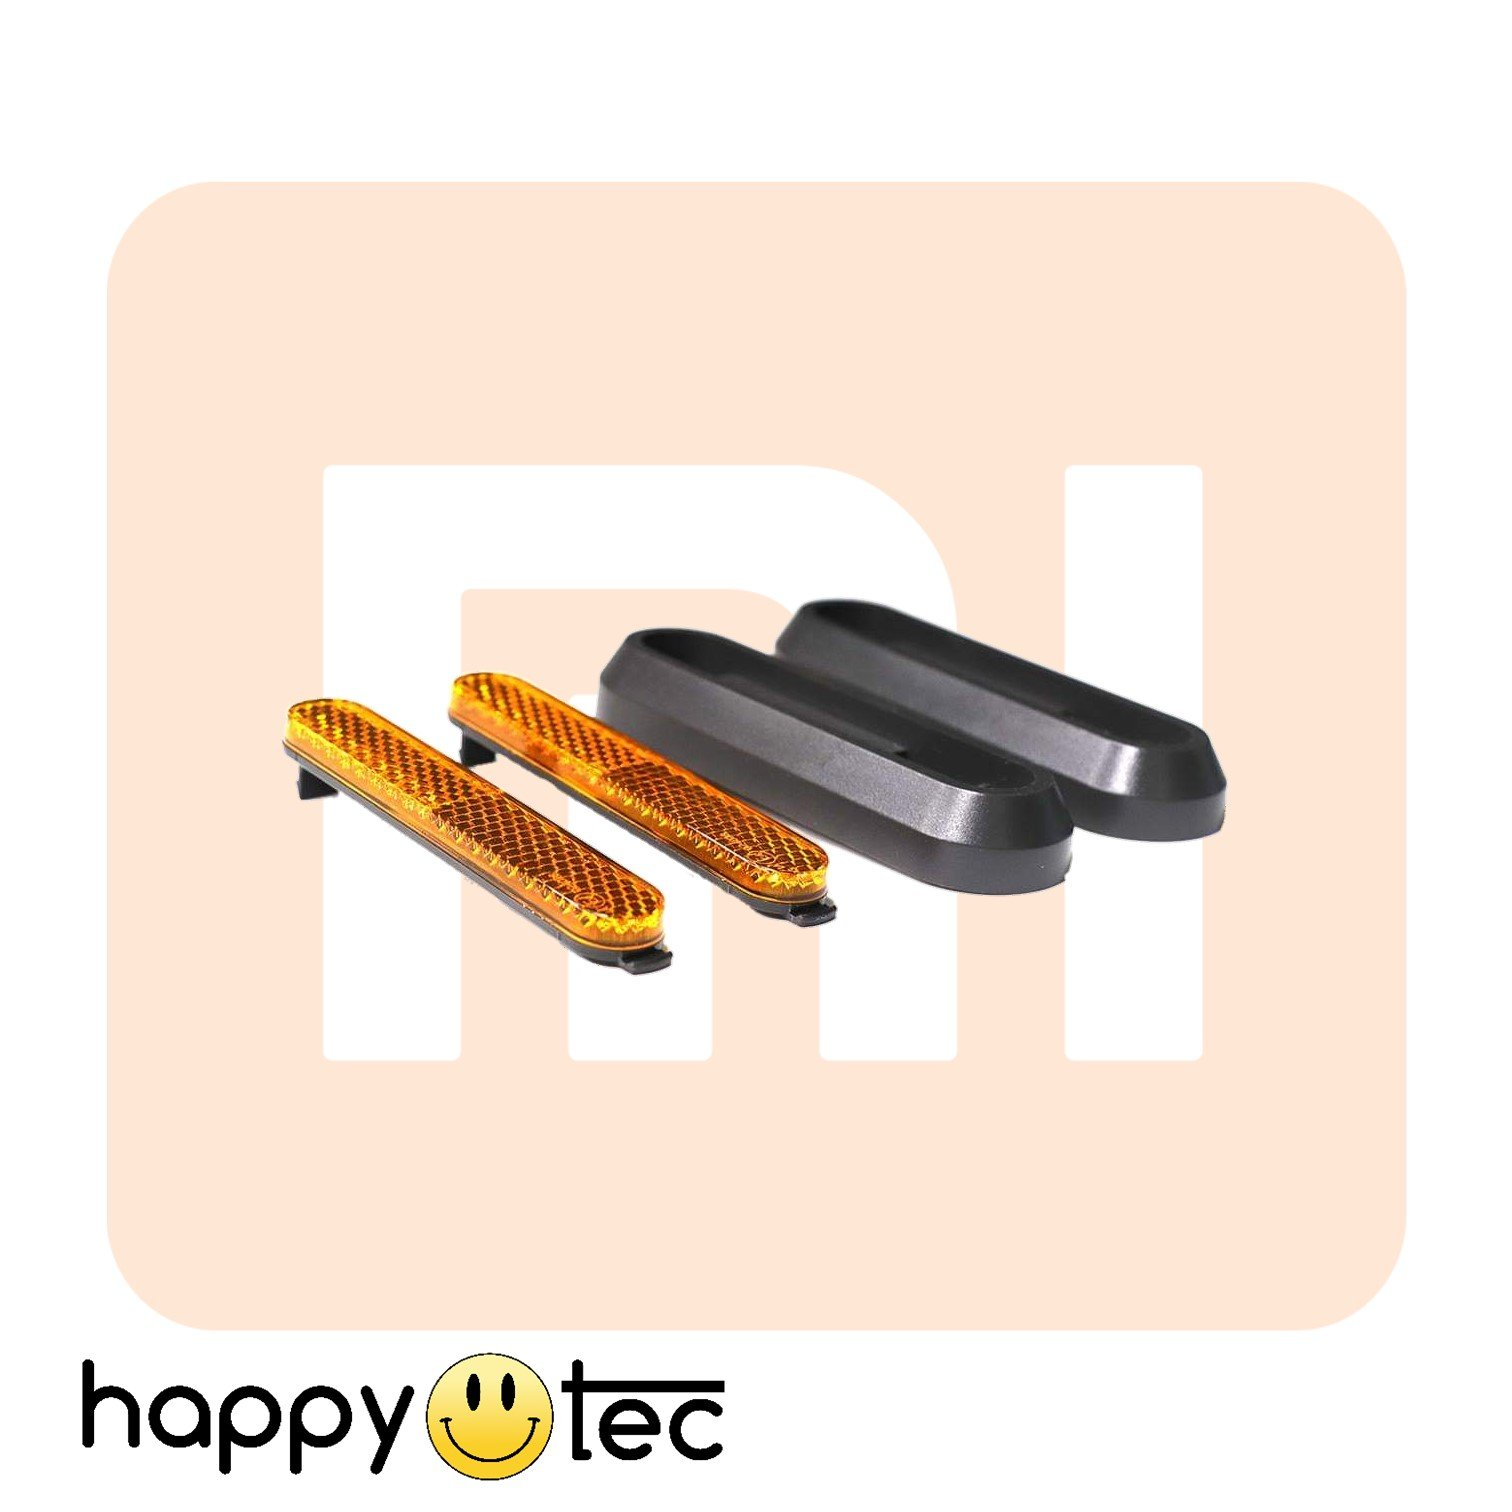 Coppia catarifrangenti posteriori per Xiaomi Essential / 1S / PRO 2